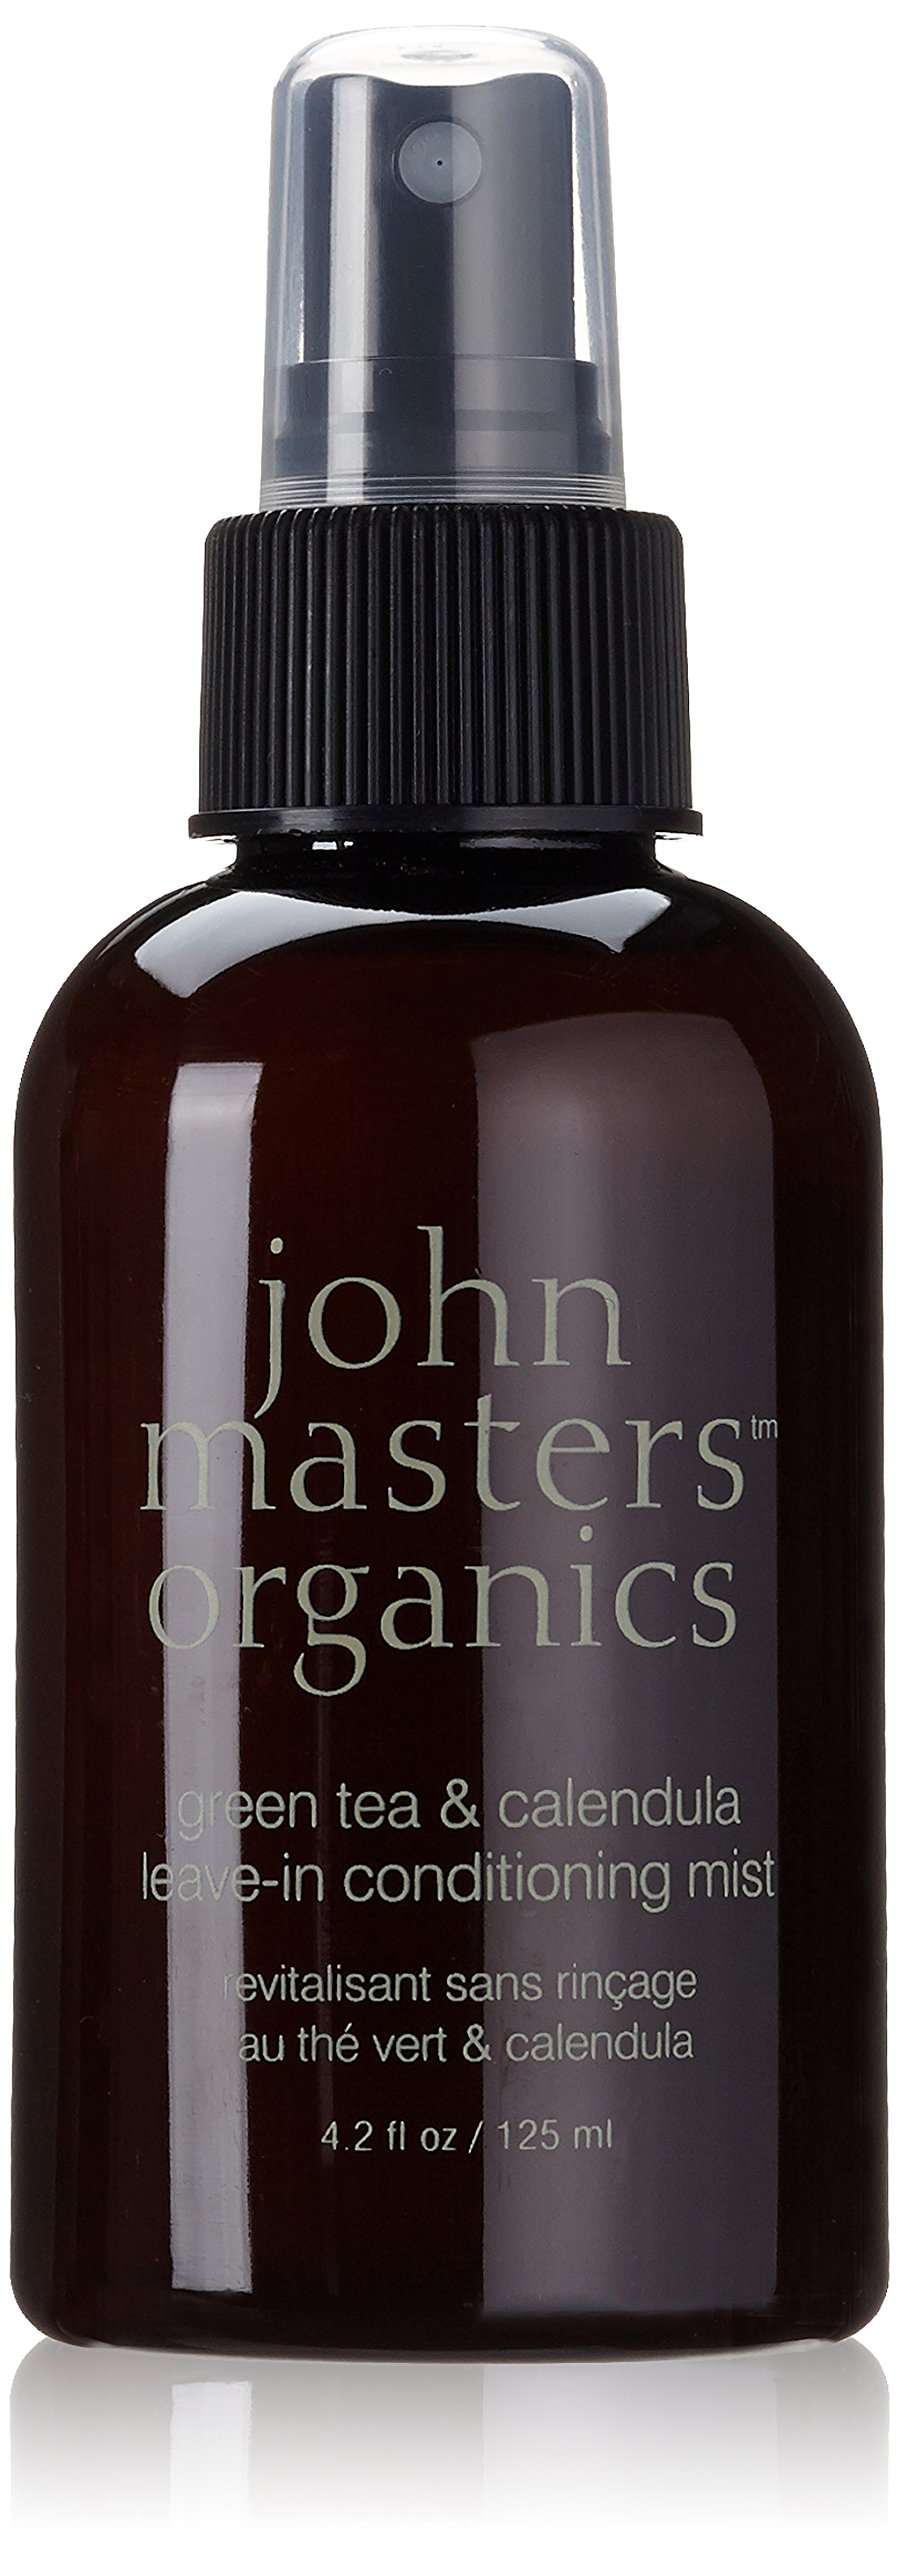 John Masters Organics Green Tea and Calendula Leave-in Conditioning Mist Spray, 4.2 Ounce